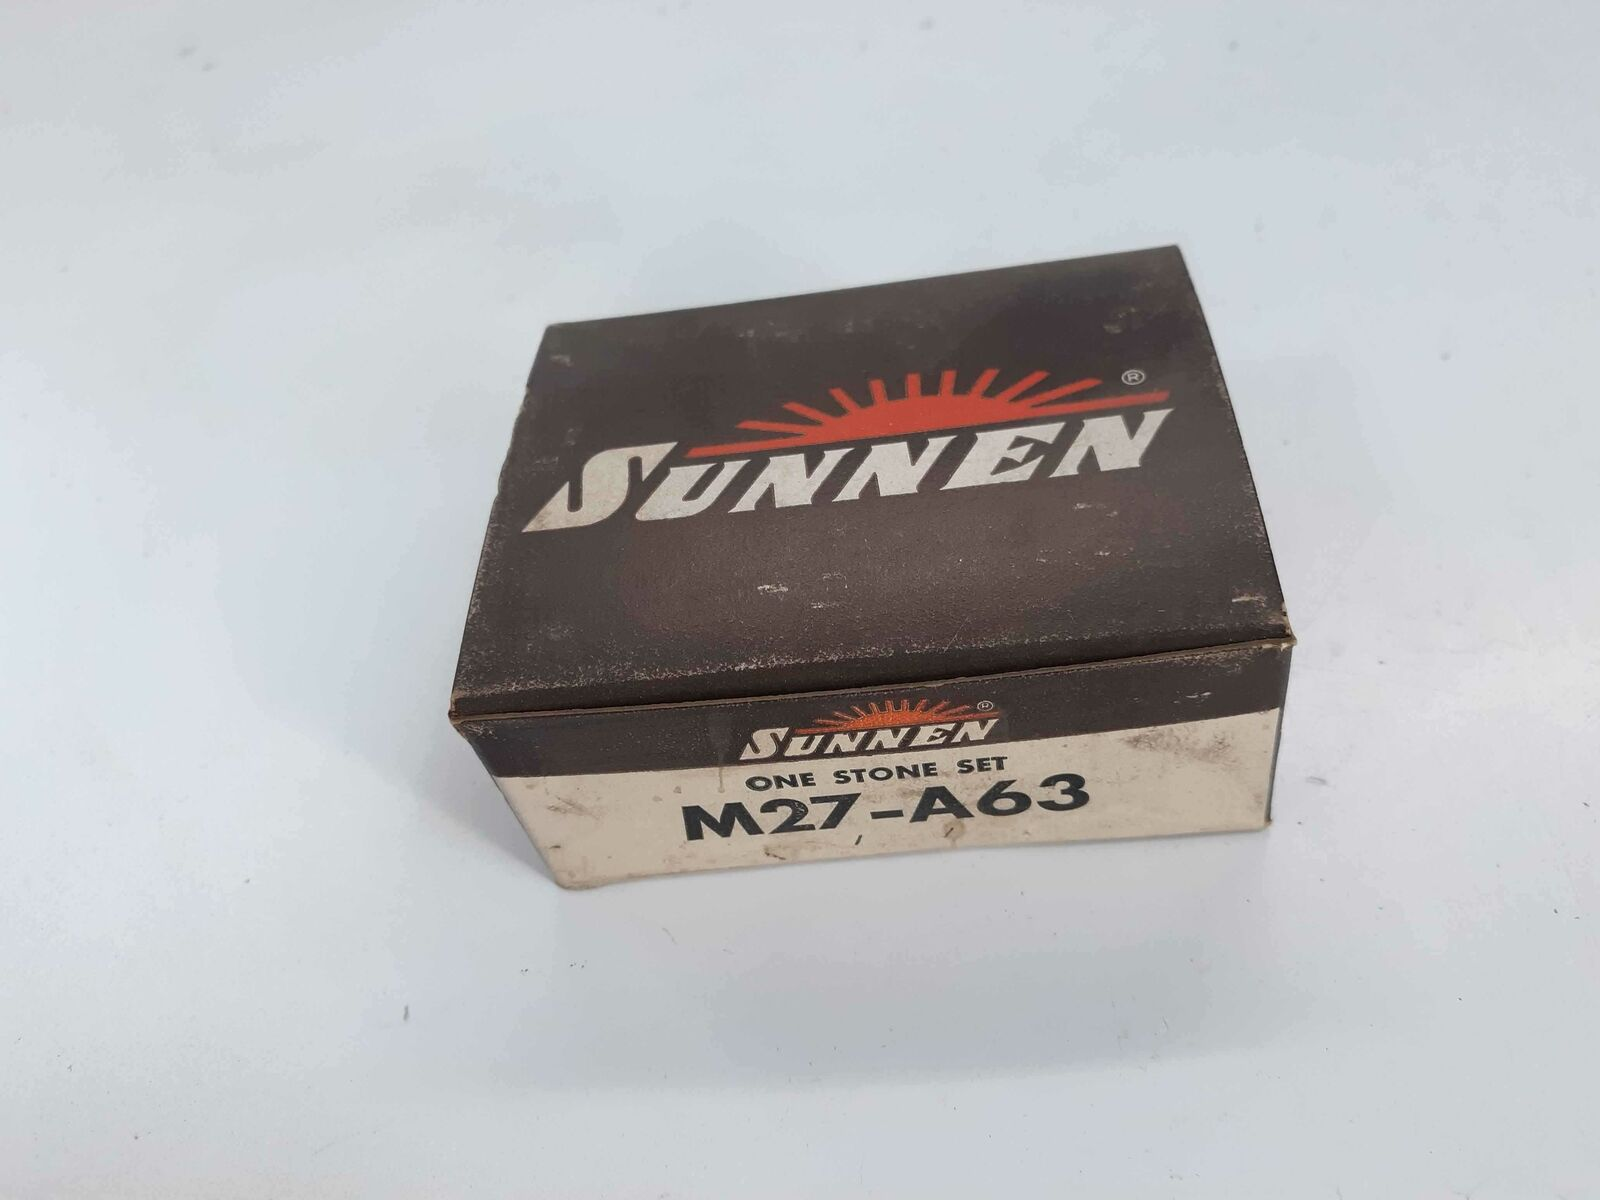 Sunnen Portable Hone M27-A45 Stone Set